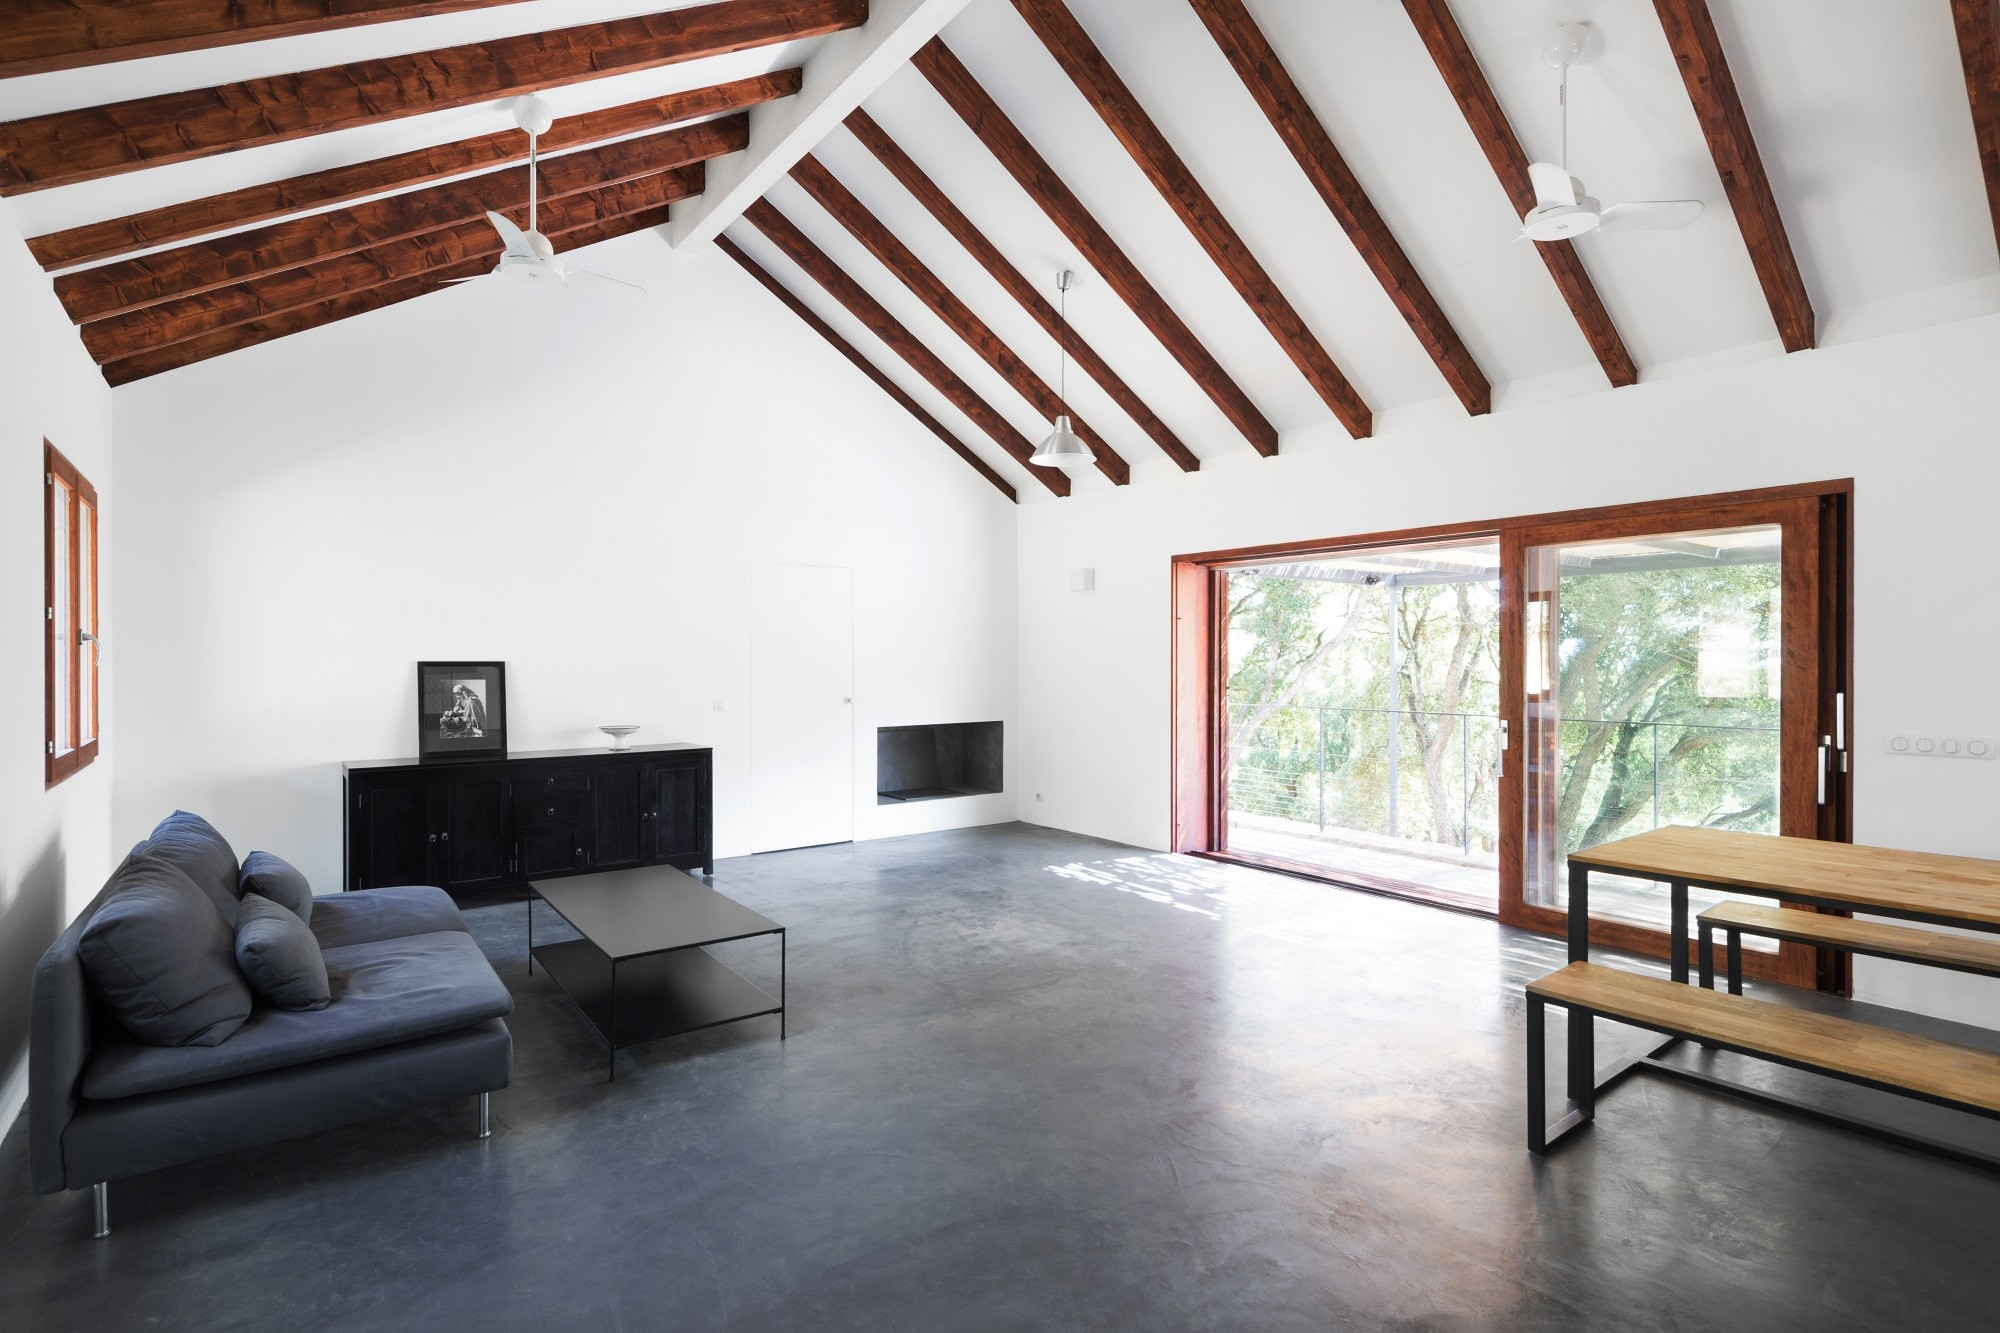 ferienhaus contemporary vernacular in conca bad und. Black Bedroom Furniture Sets. Home Design Ideas